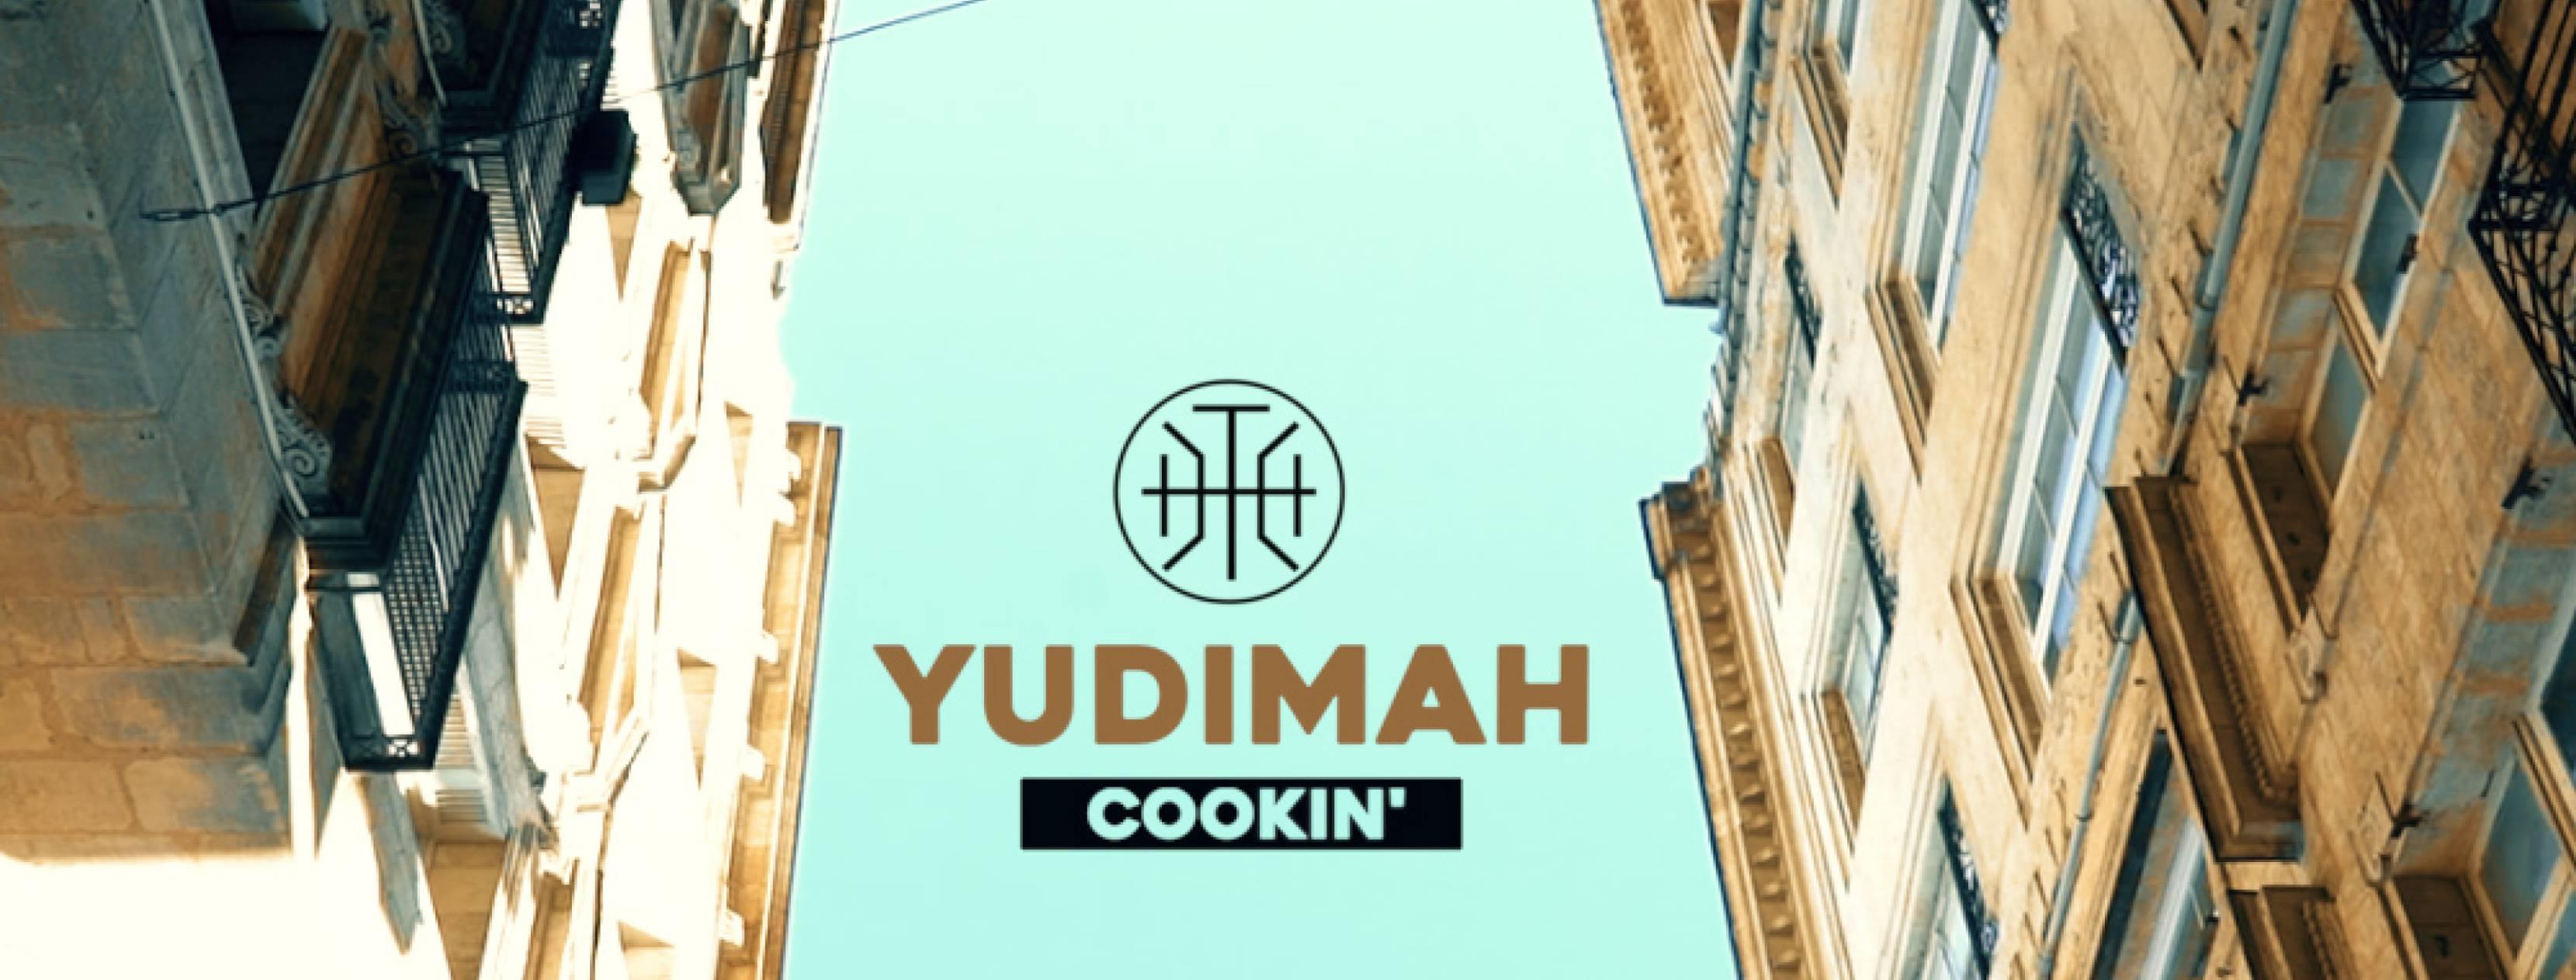 Yudimah - Cookin' (bannière)